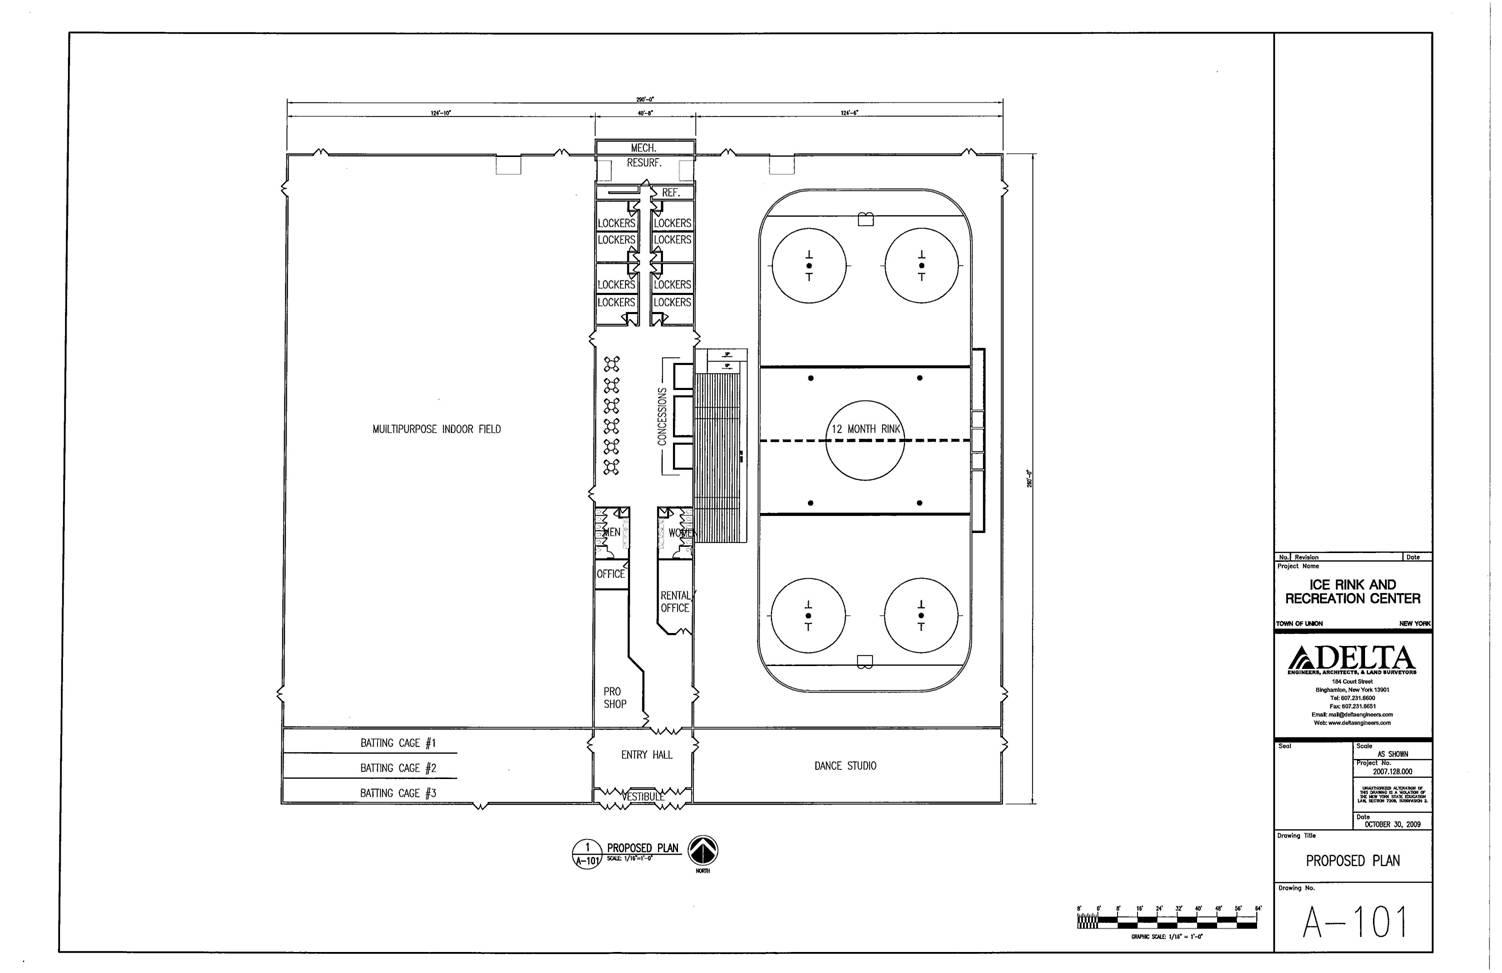 Roller Skating Rink Floor Plans Skating Rink Floor Plans Fatare Blog